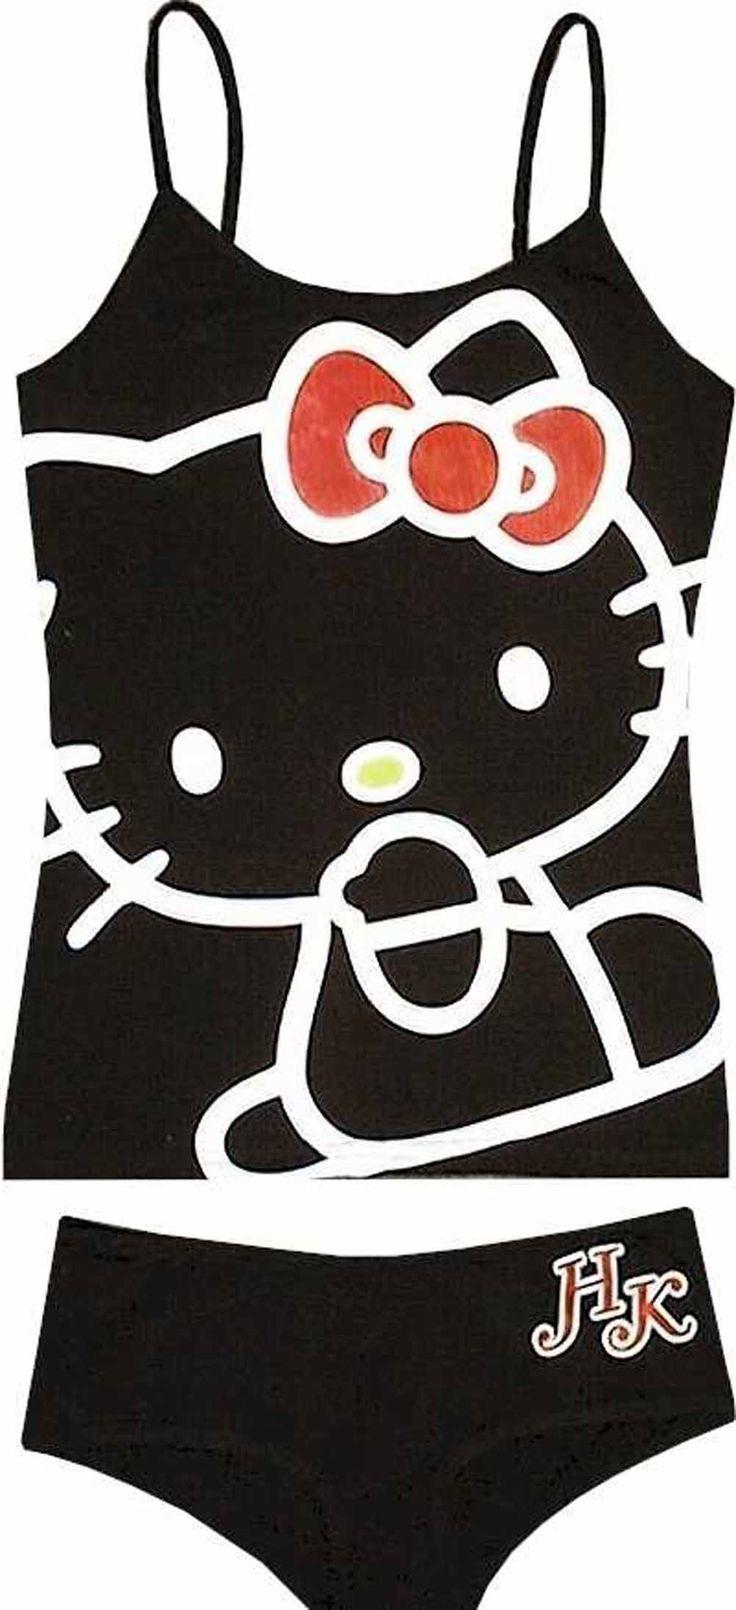 Black and white hello kitty shower curtain - Hello Kitty Face Black White Cami Panty Set